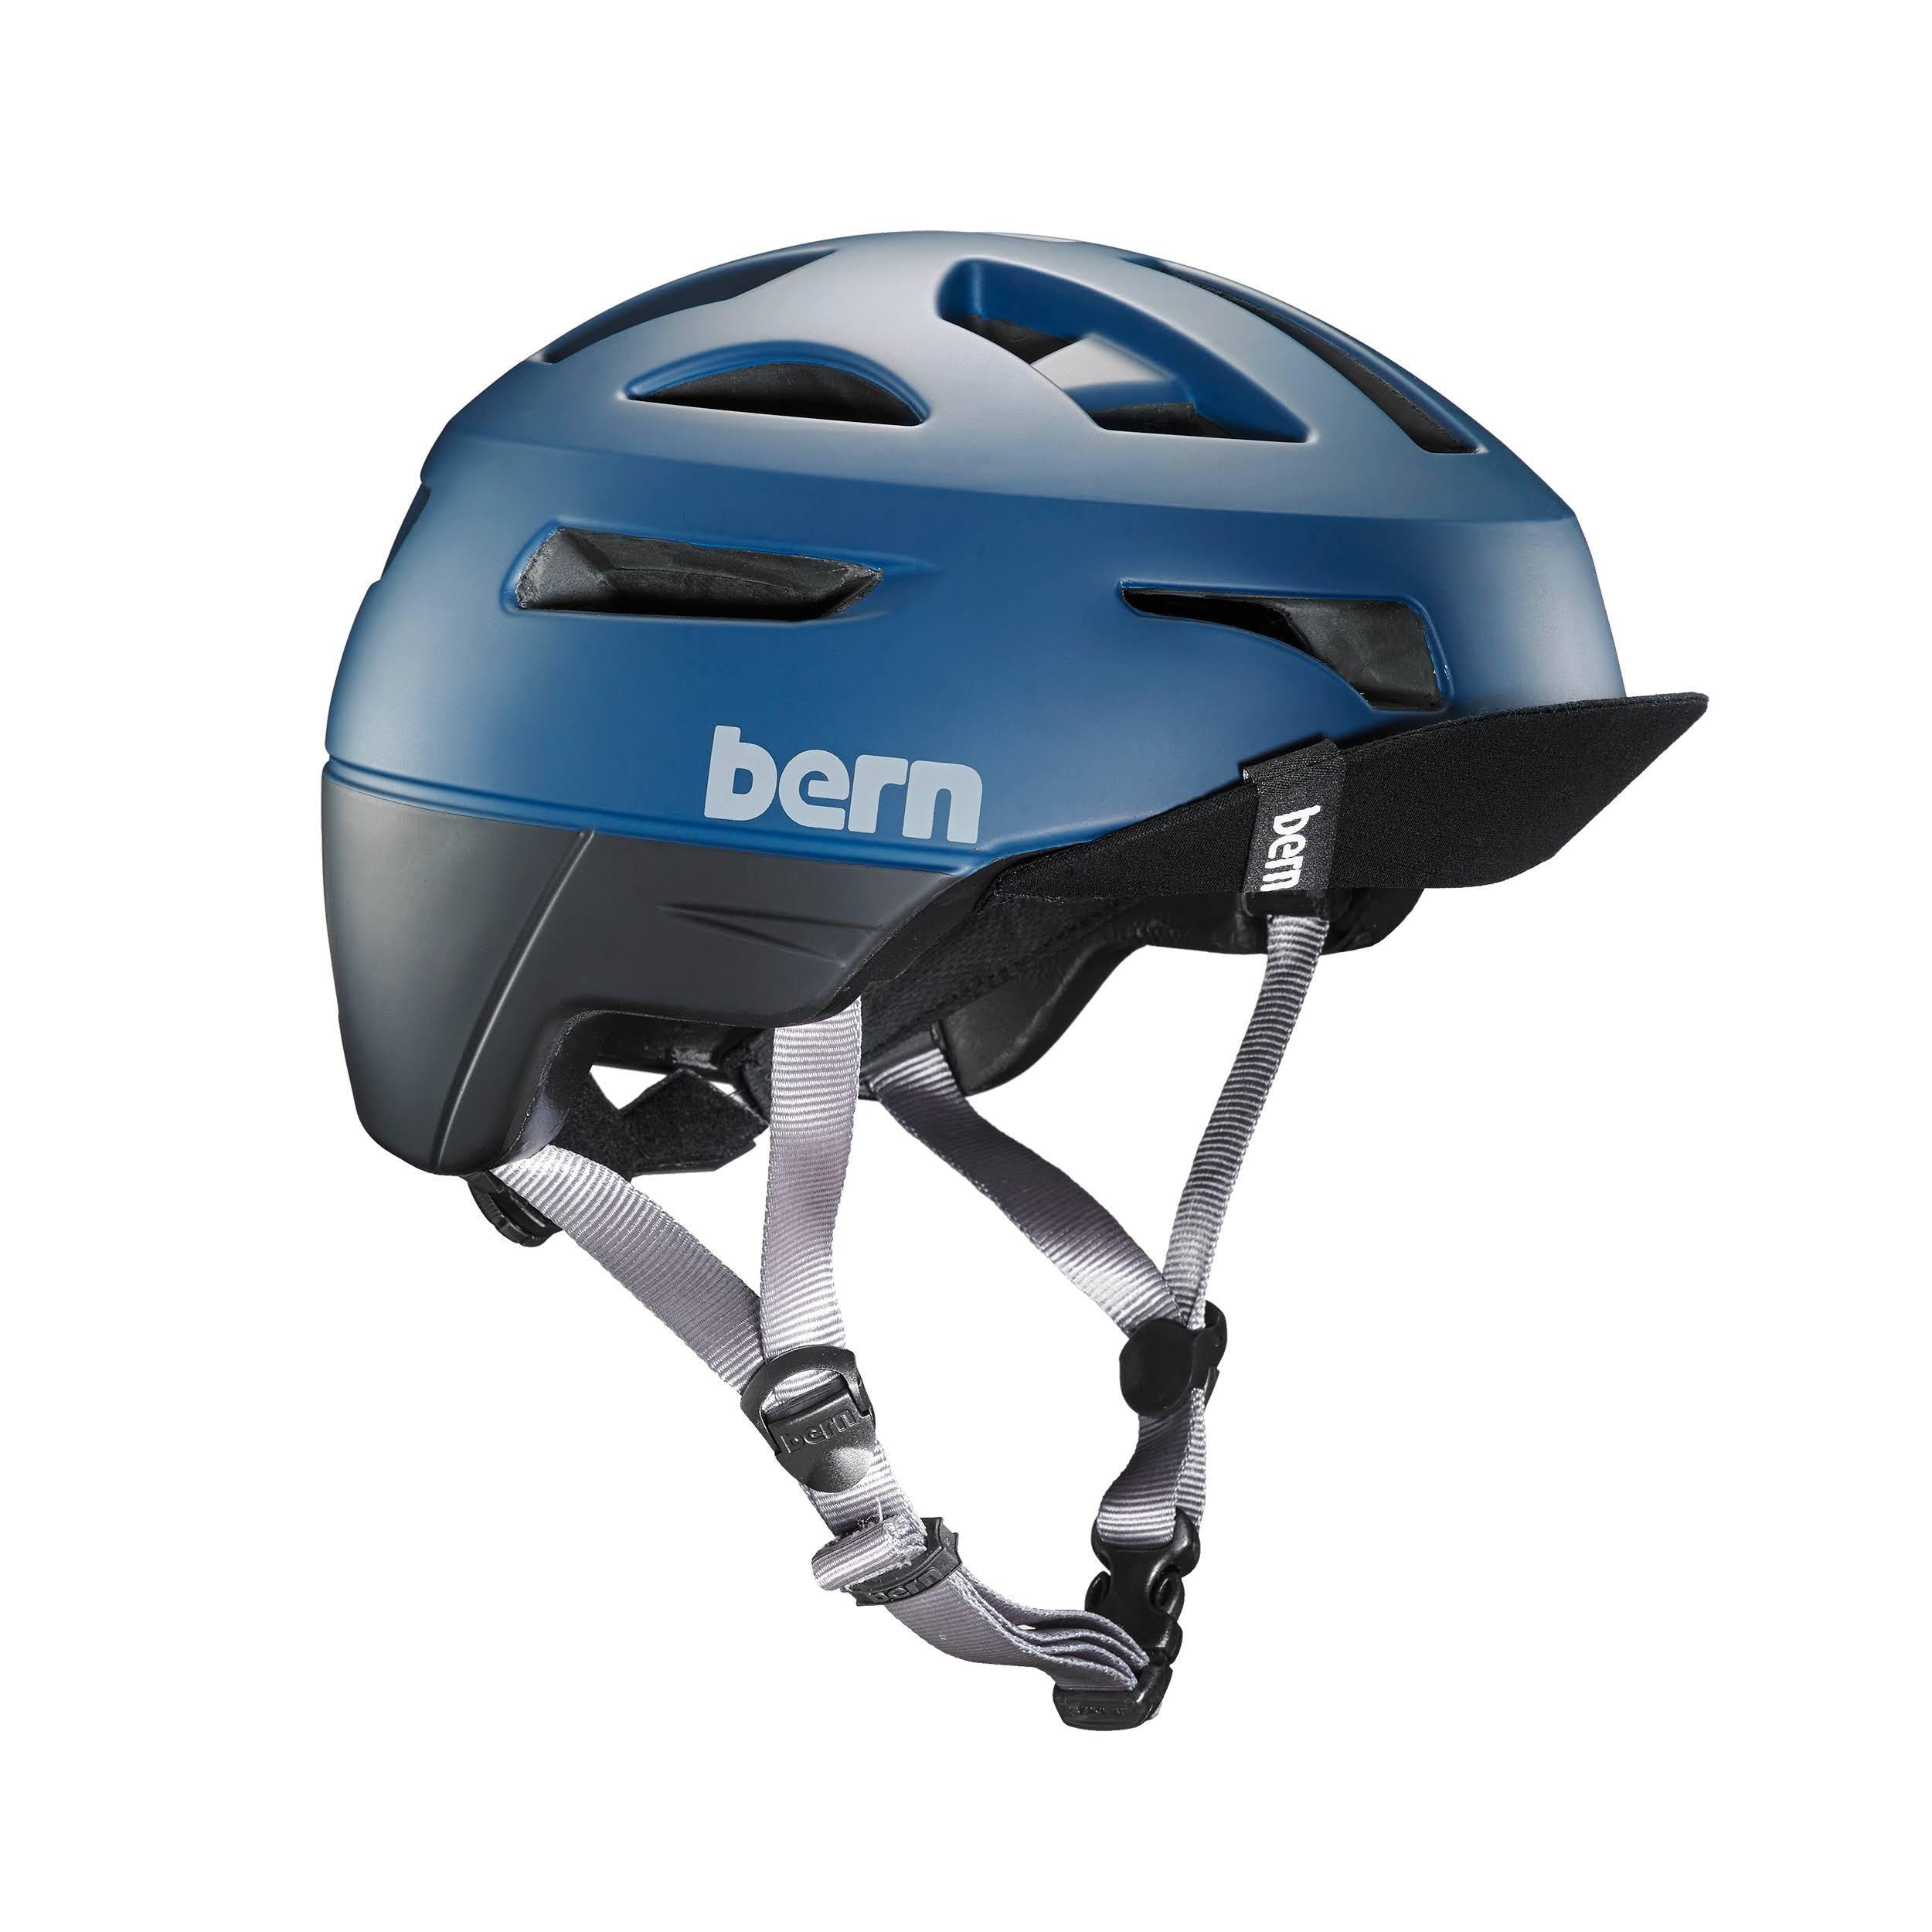 Bern Union Helmet Matte Muted Teal / S